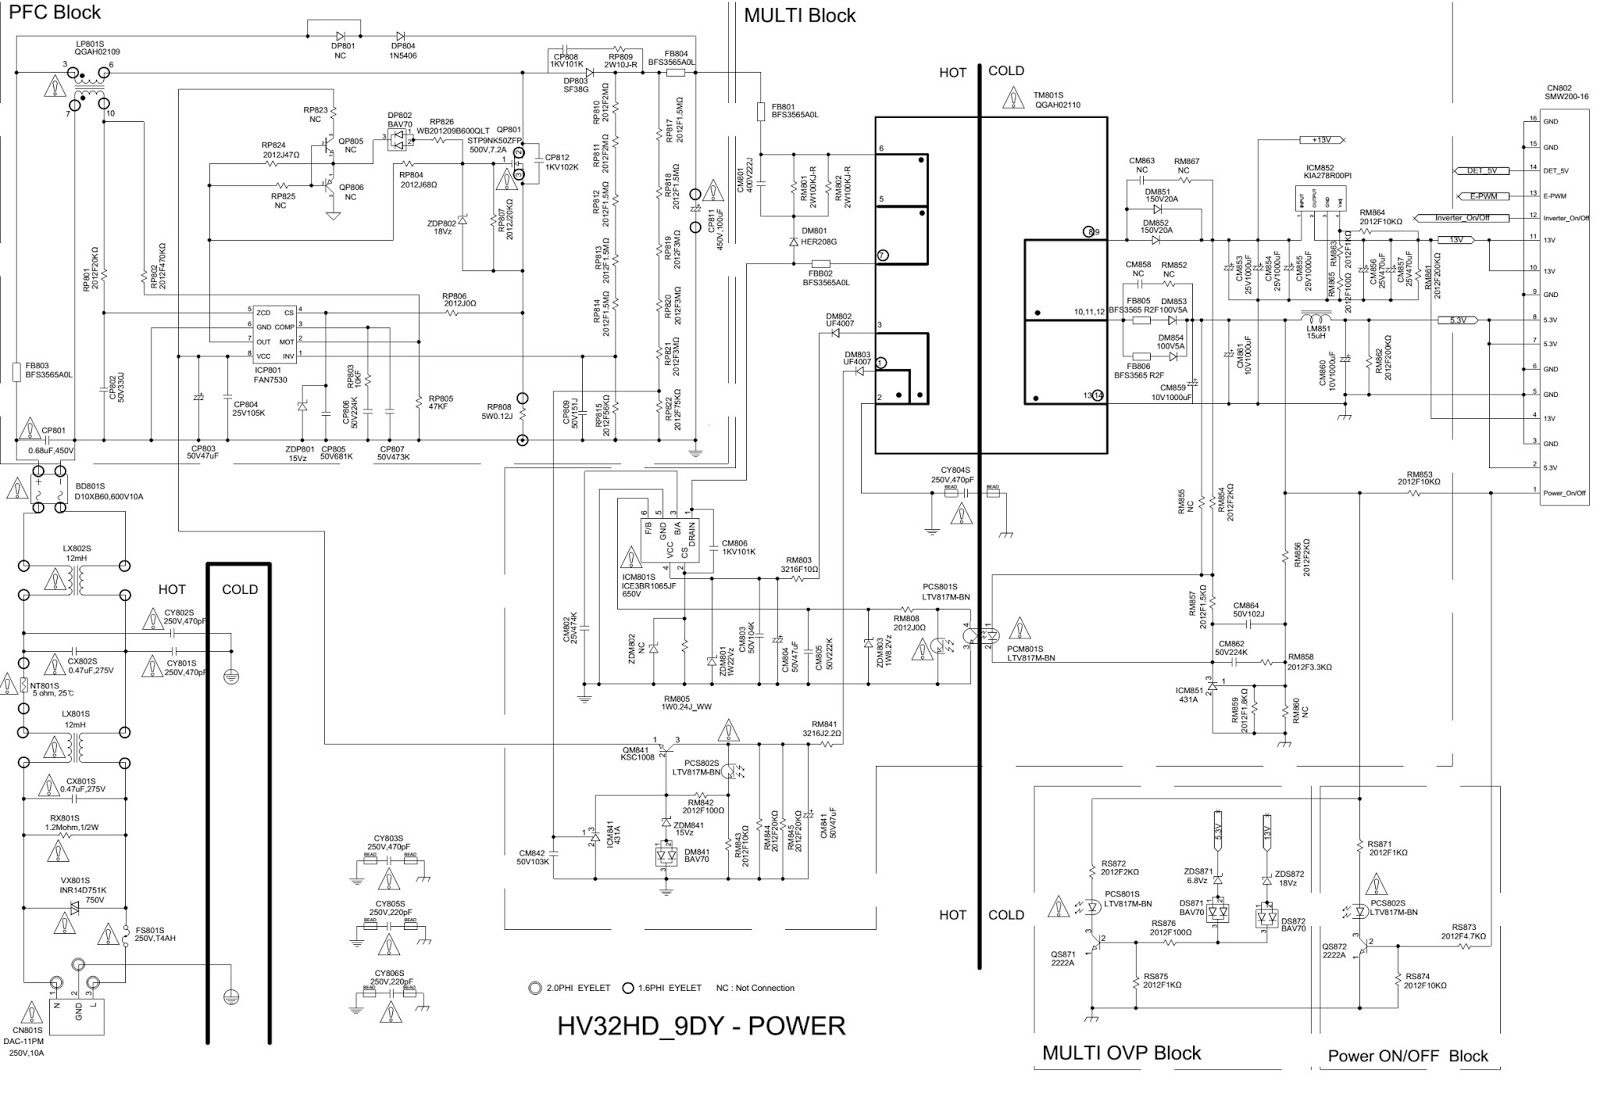 Some mon samsung tv circuit diagrams | Learn Basic